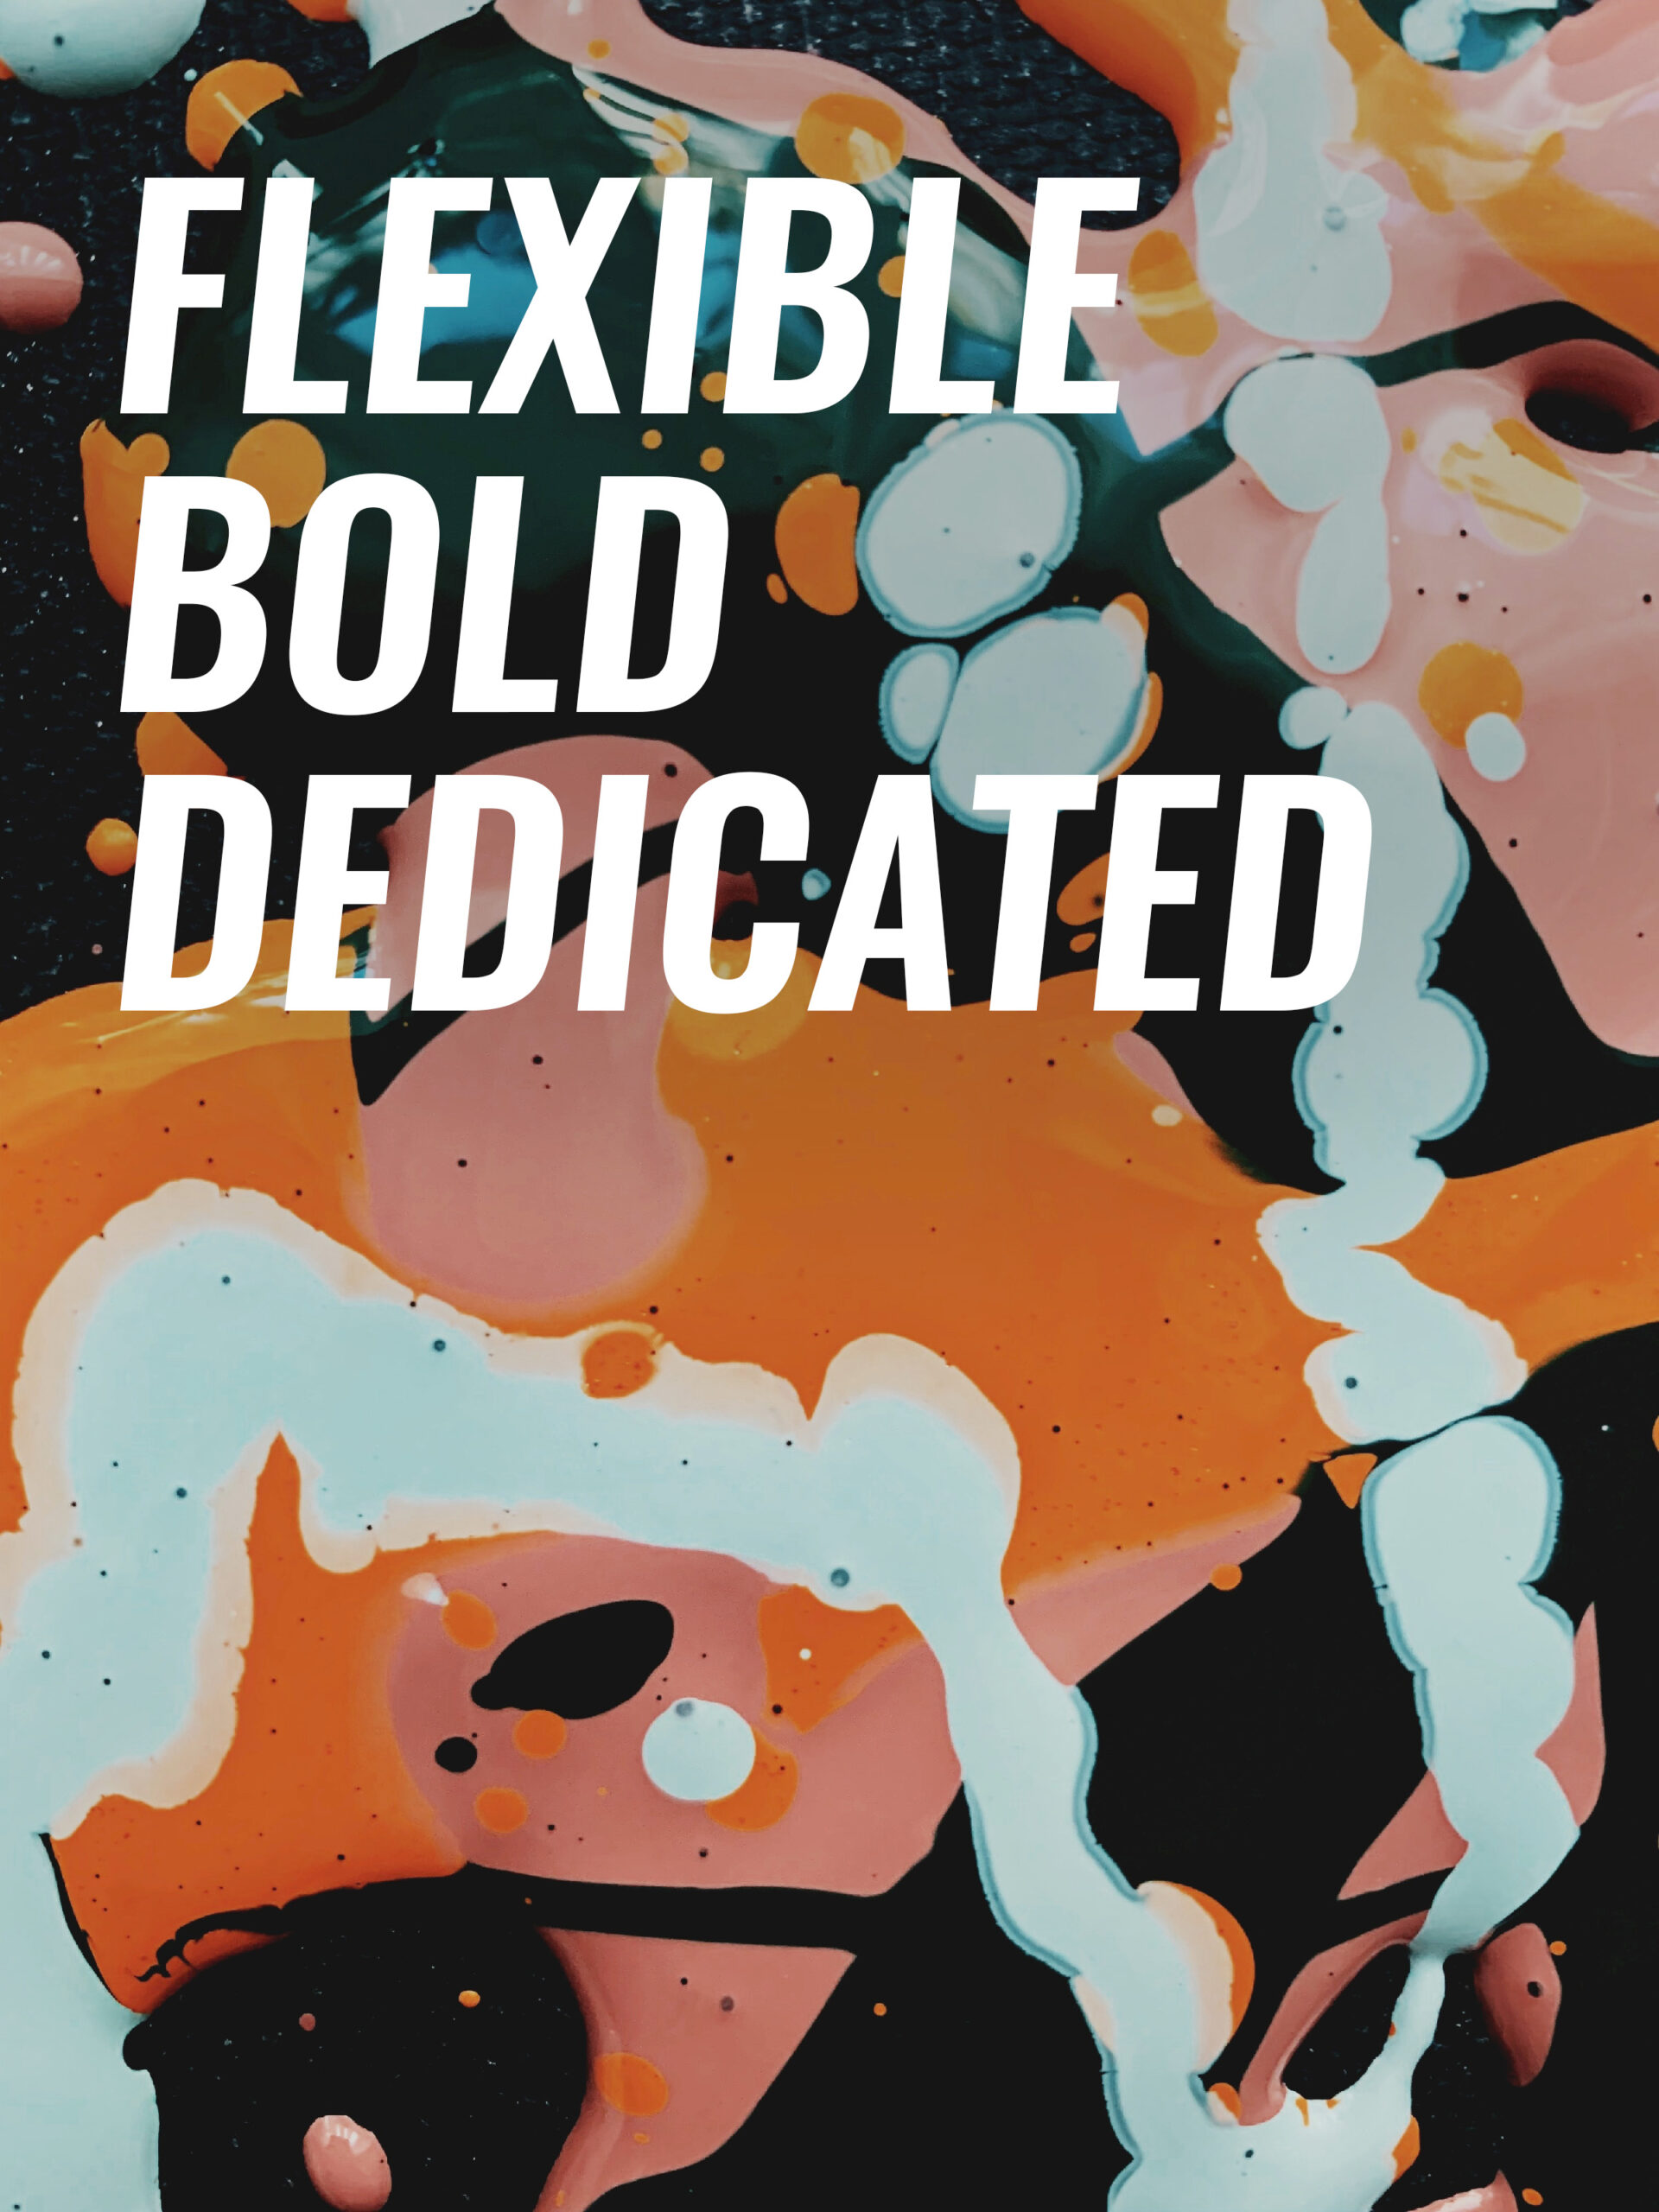 JOC Studio - Flexible, bold, dedicated